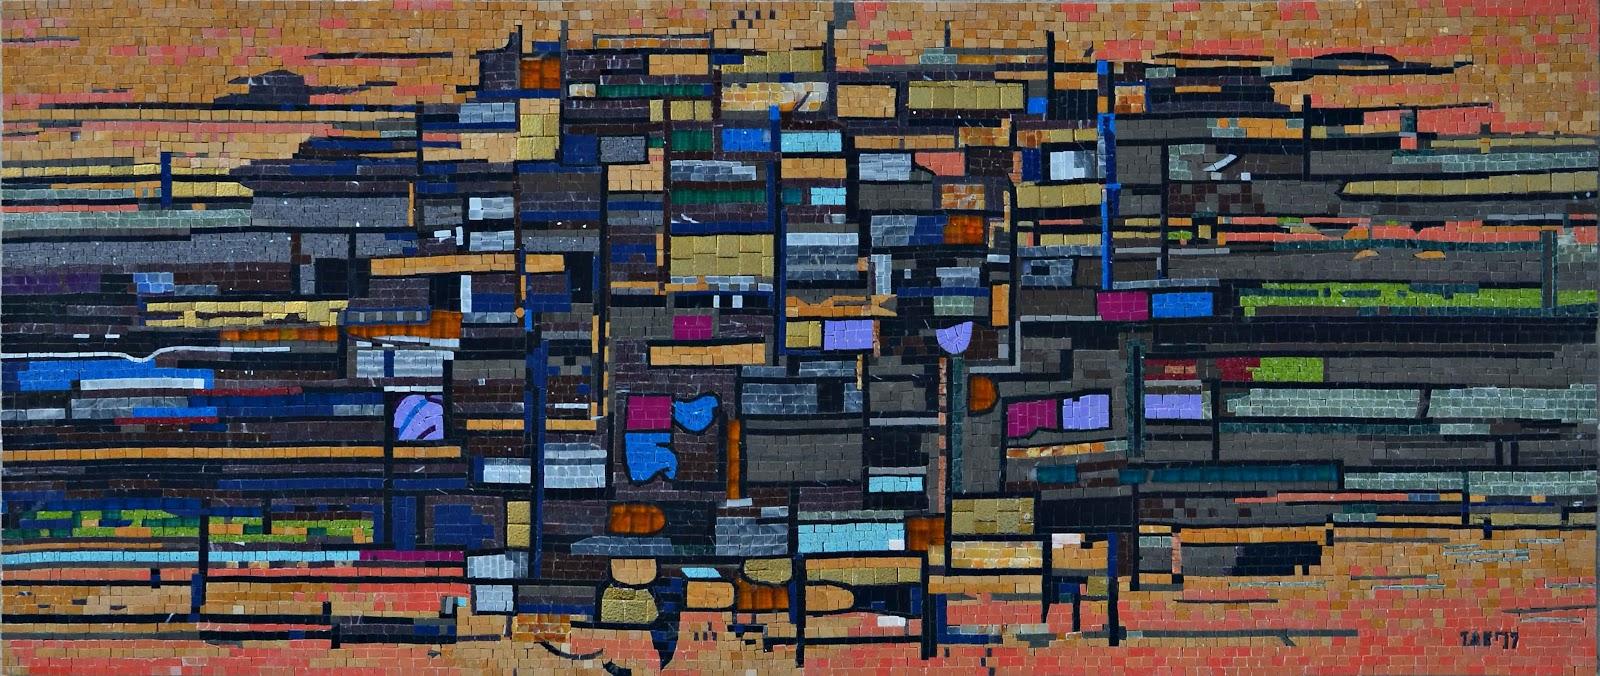 Striking Widows - Abstract Mosaic Artwork by Mozaico